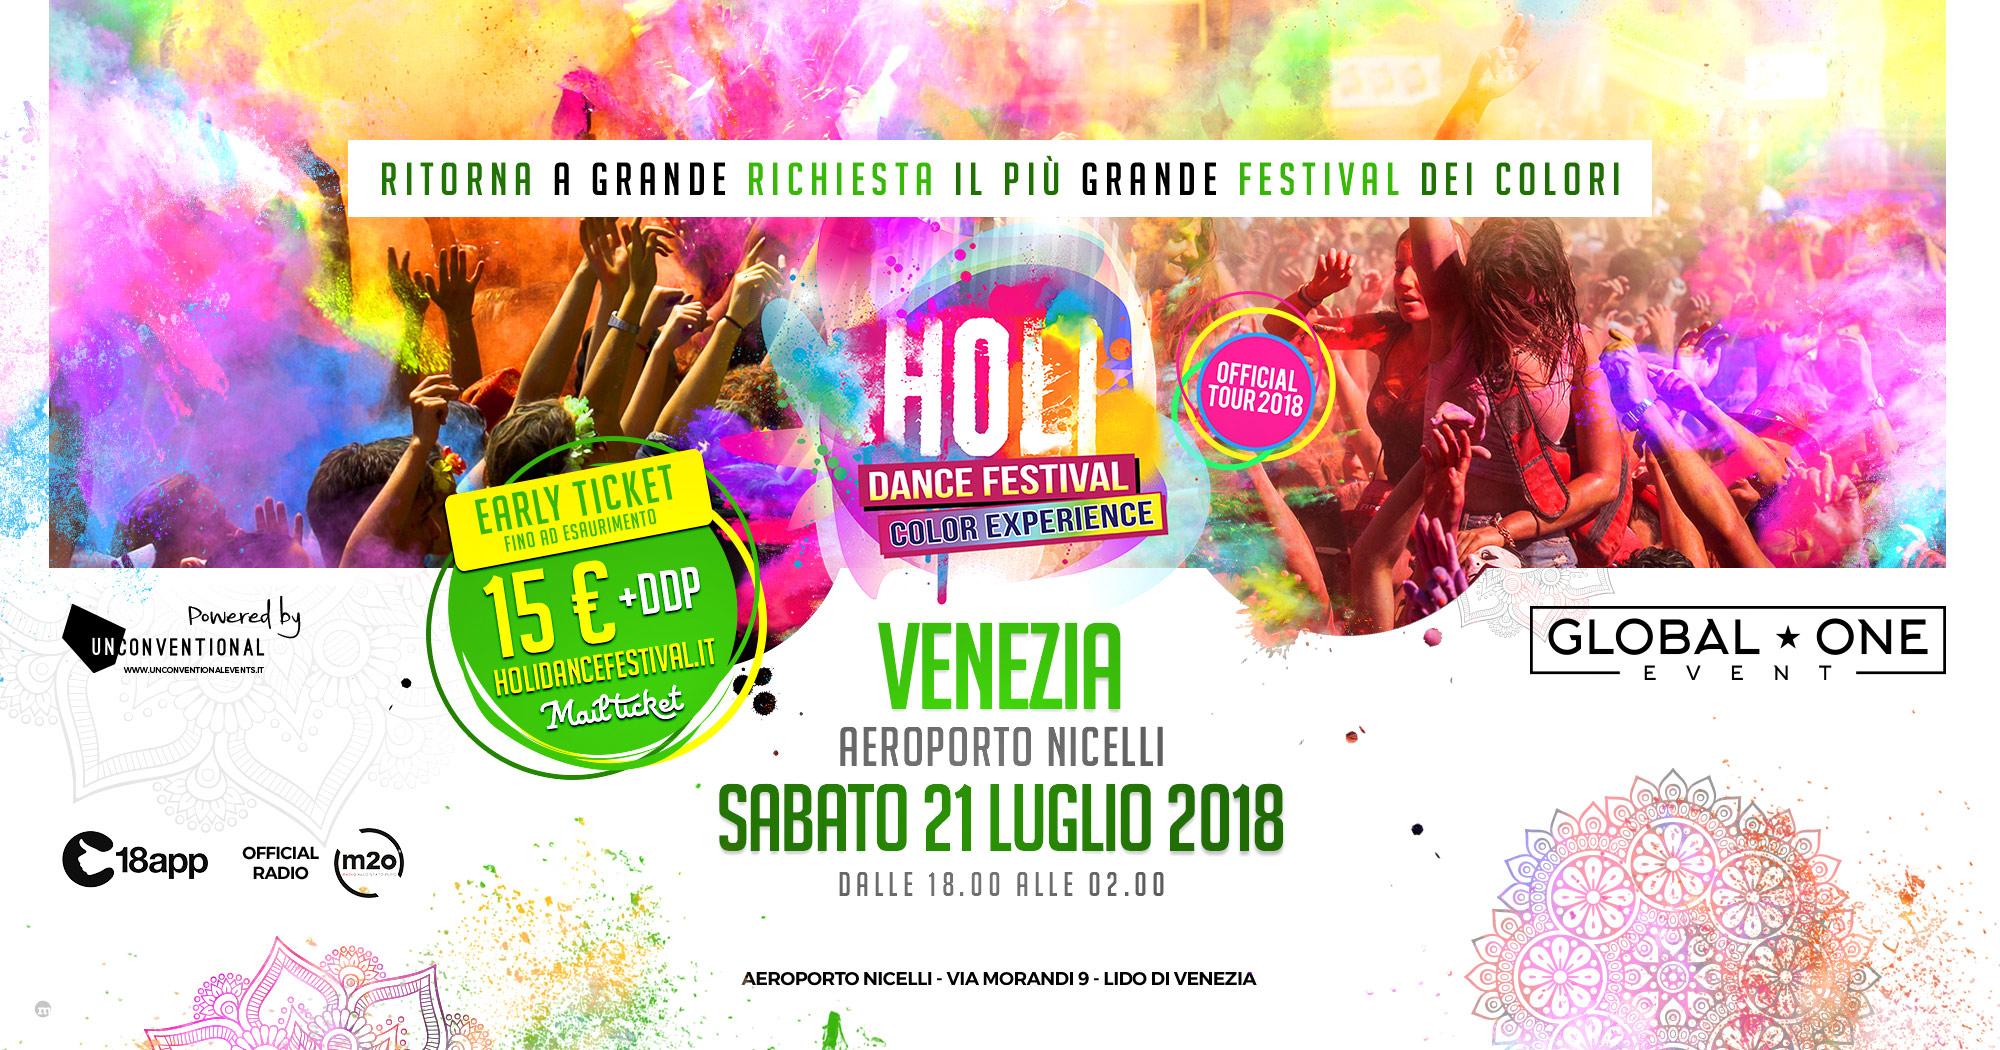 Holi 21 luglio Venezia